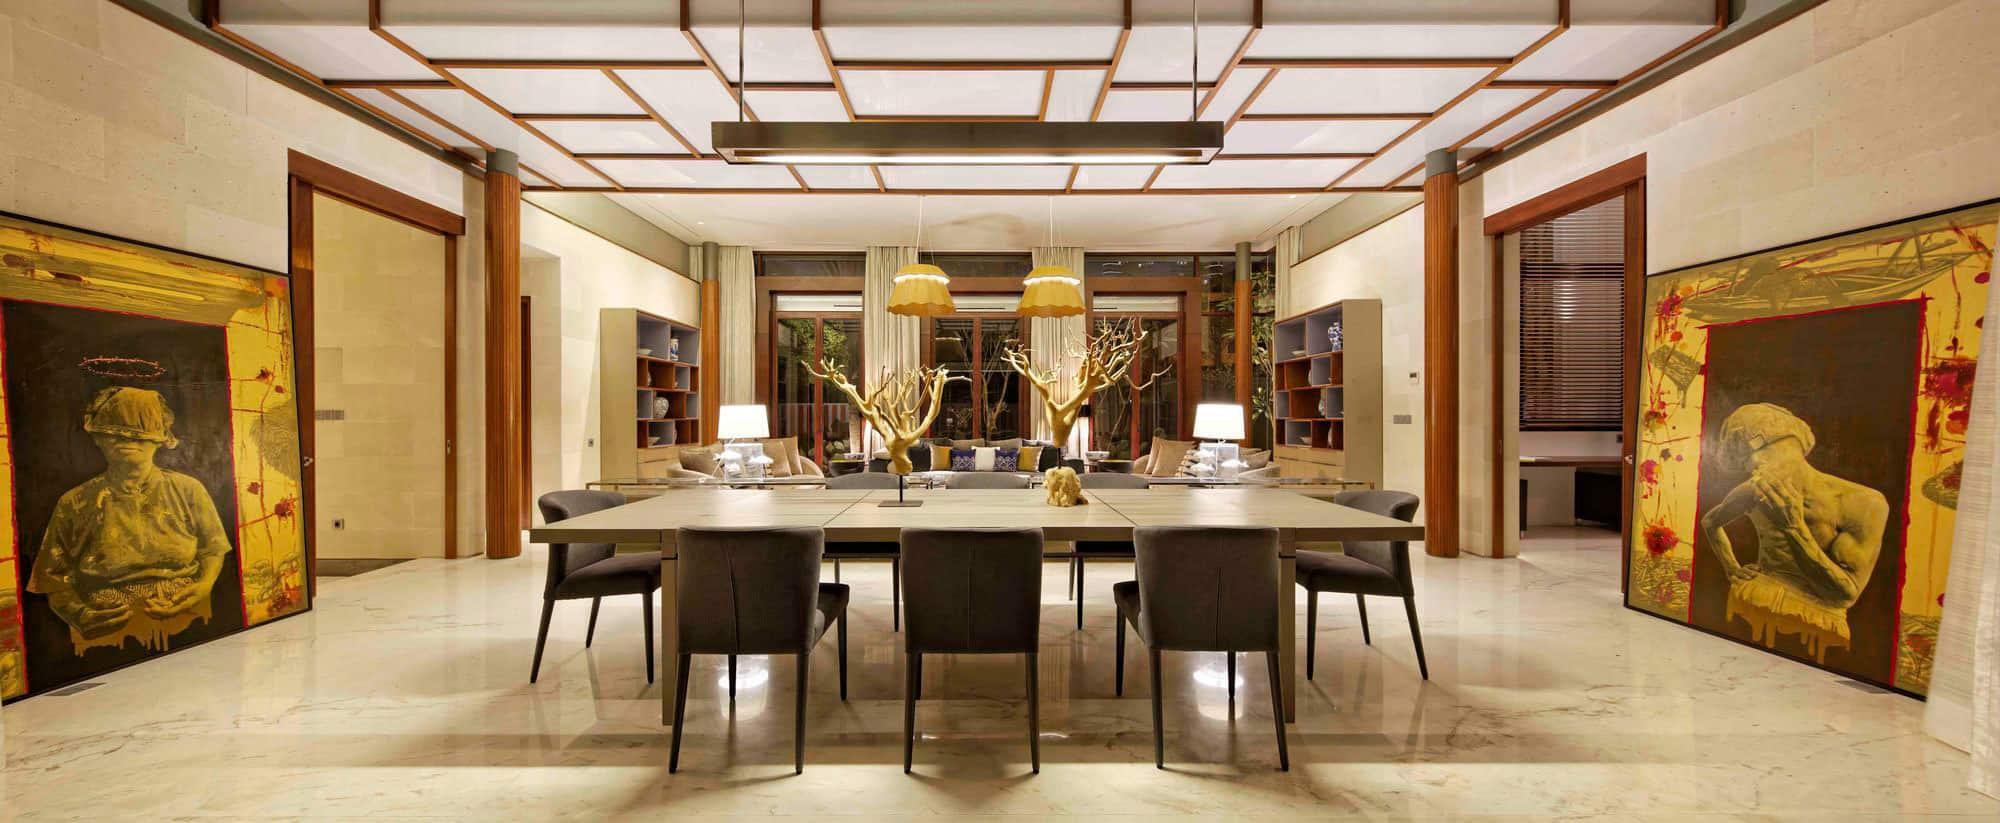 House design indonesia - House